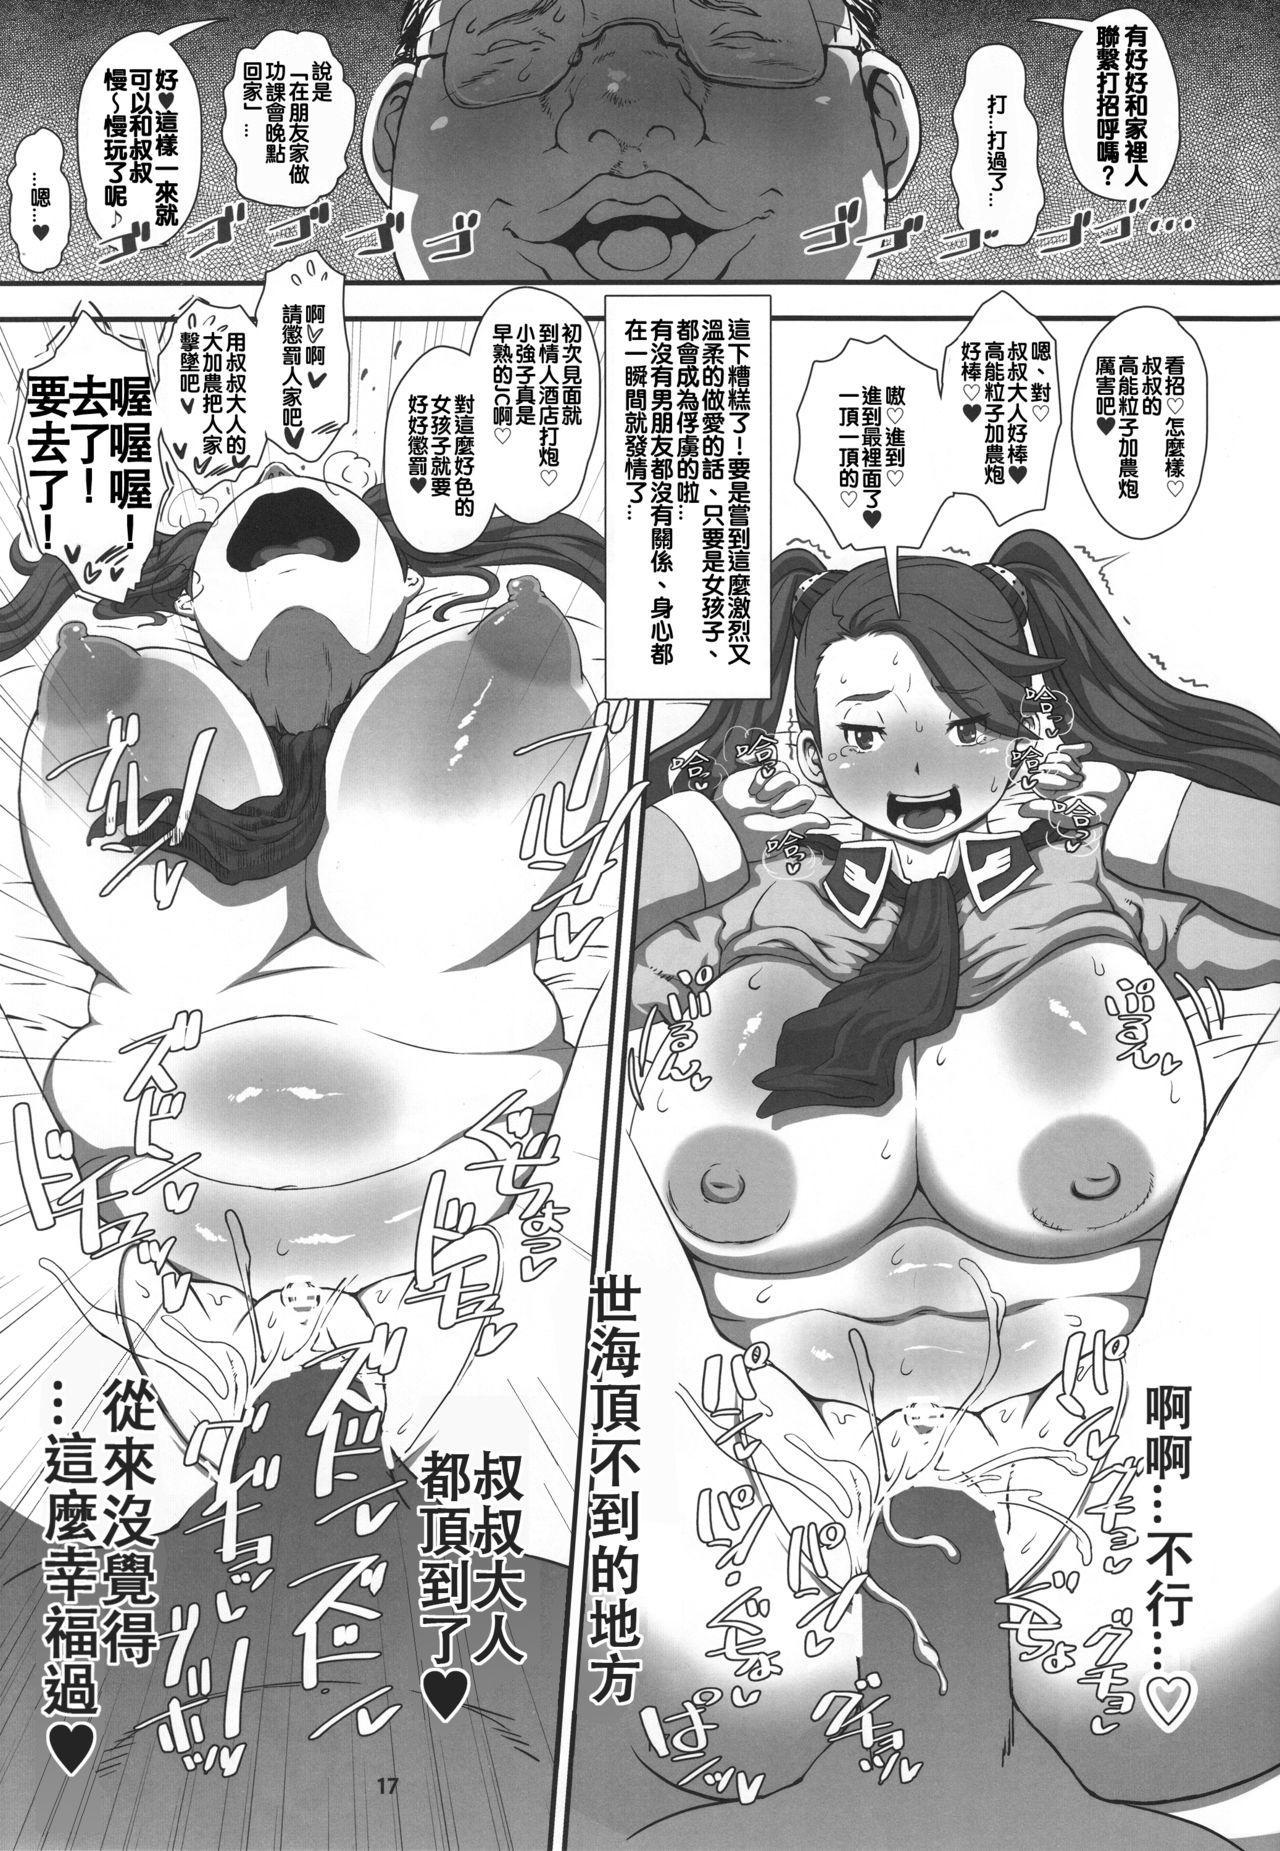 METABOLISM G Hatsujou Gyanko no Nikushoku Fudeoroshi + NTR | 肥滿主義G 發情強子的肉食開苞+NTR 16